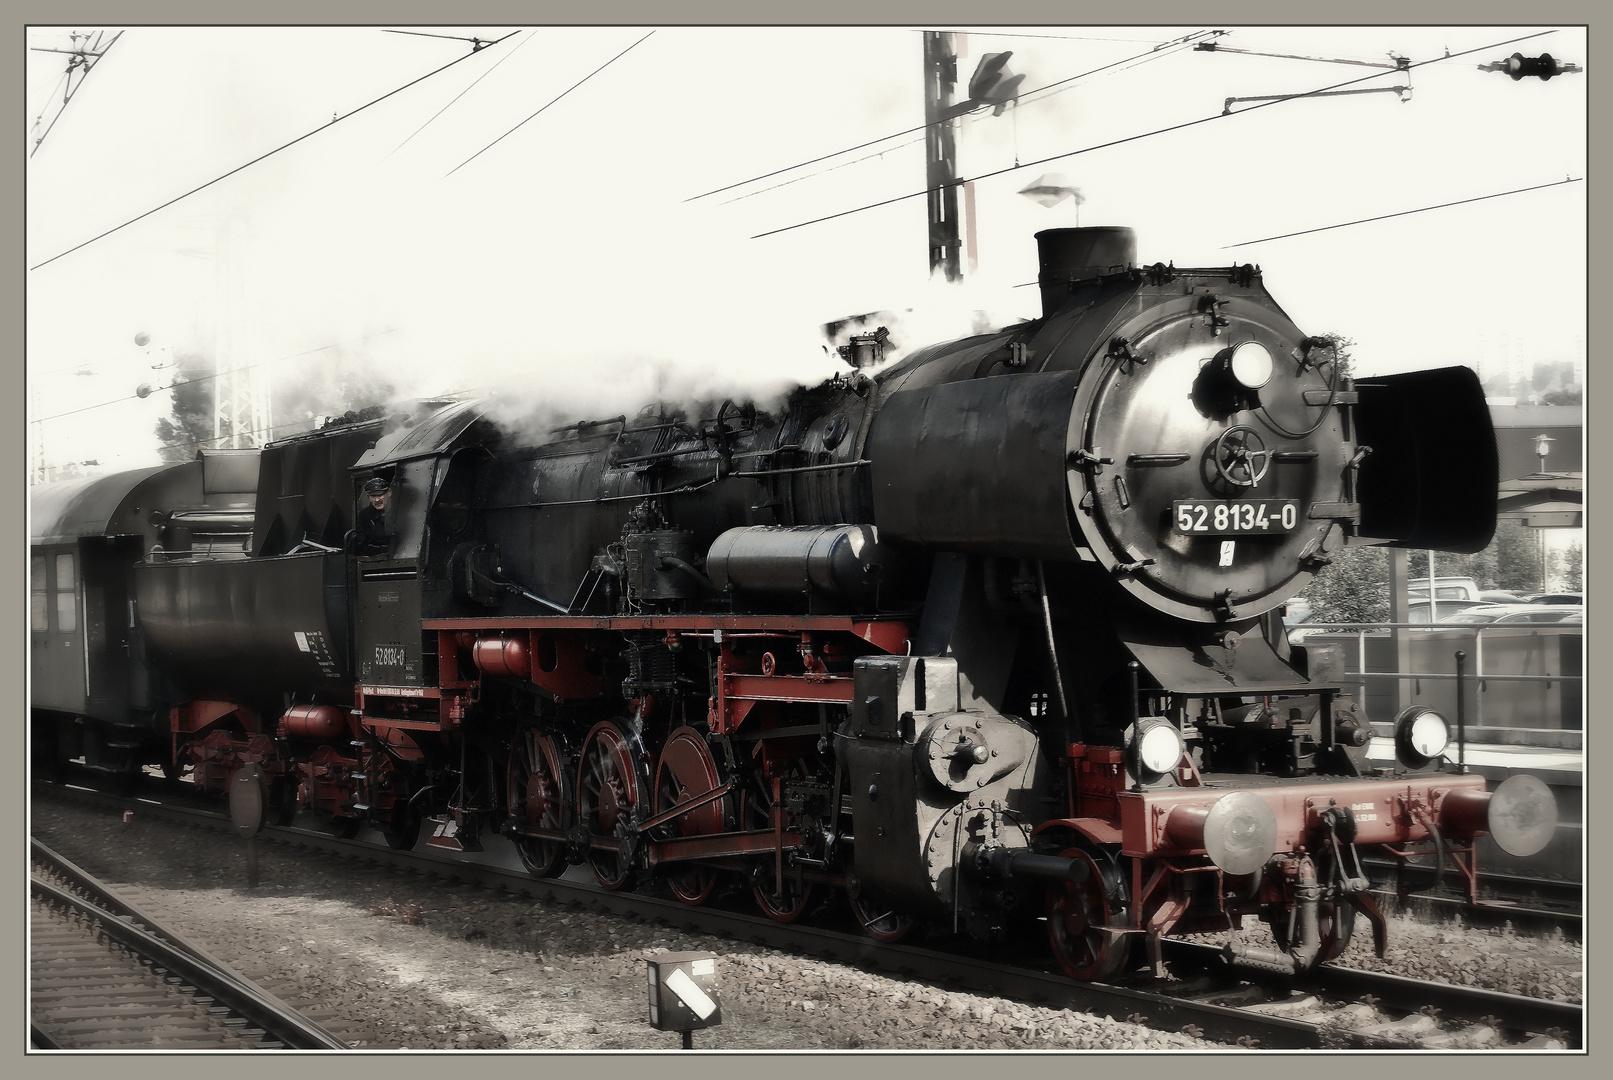 BR 52 8134-0